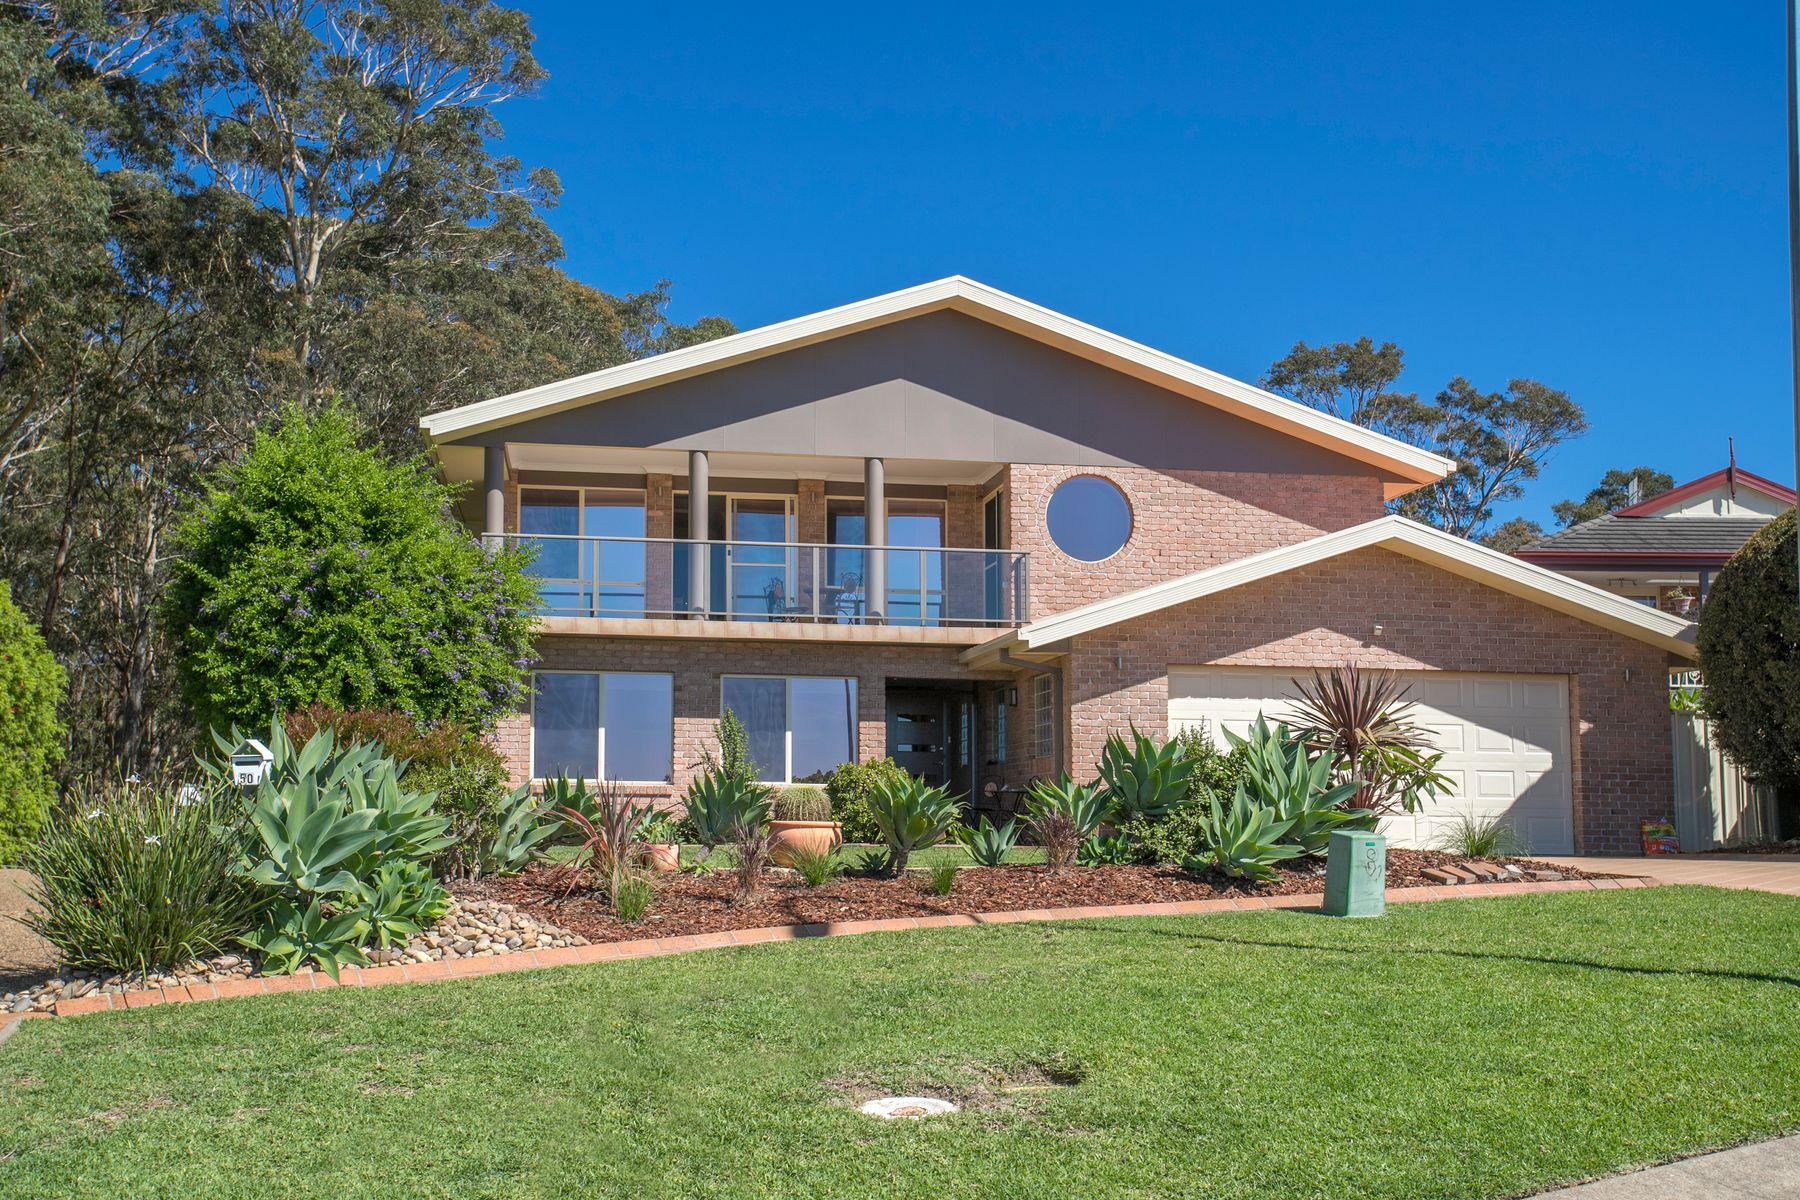 52 Blairs Road, Long Beach, NSW 2536